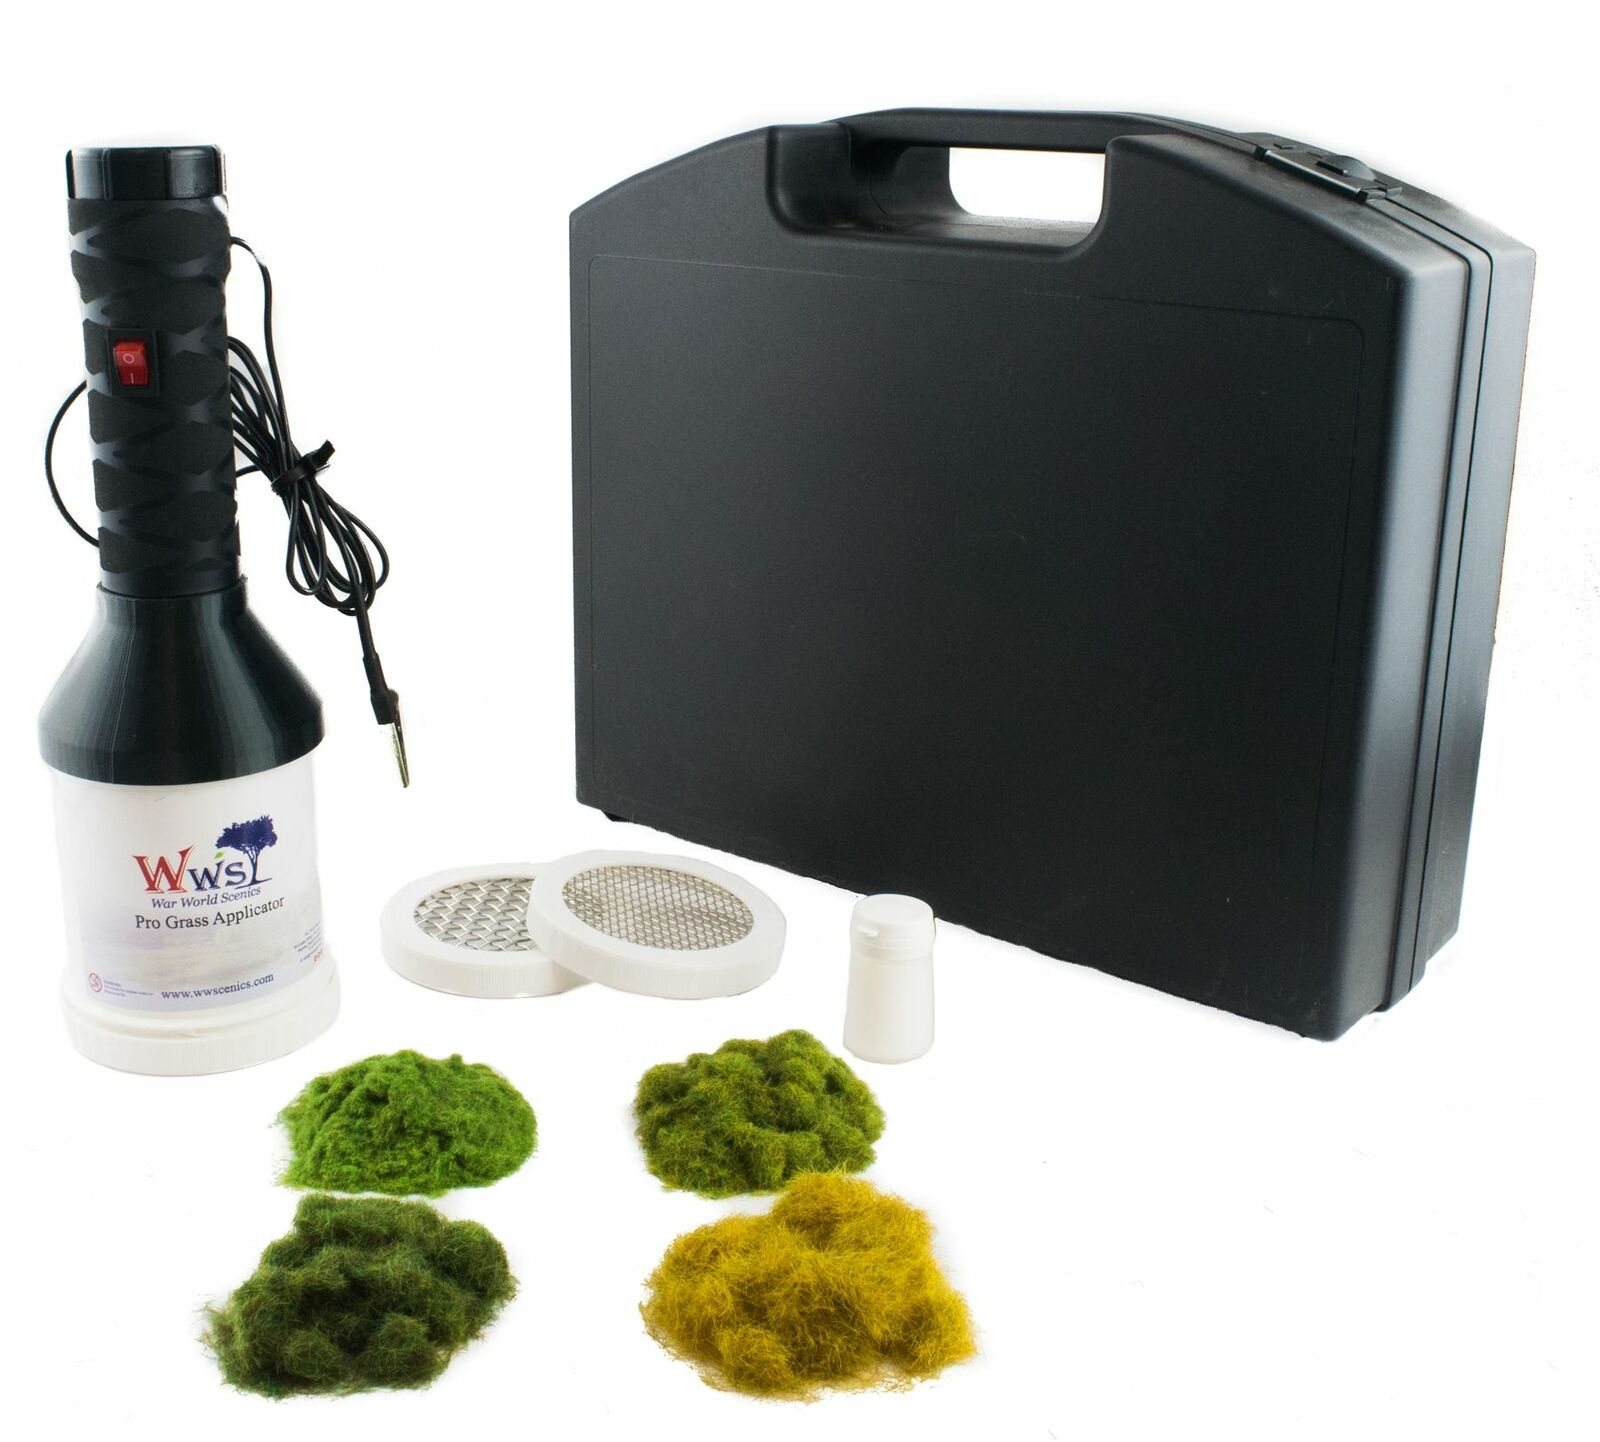 WWS Pro Grass Grand begrasungsgerät Starter Set-Modello Treno Modellismo terreno